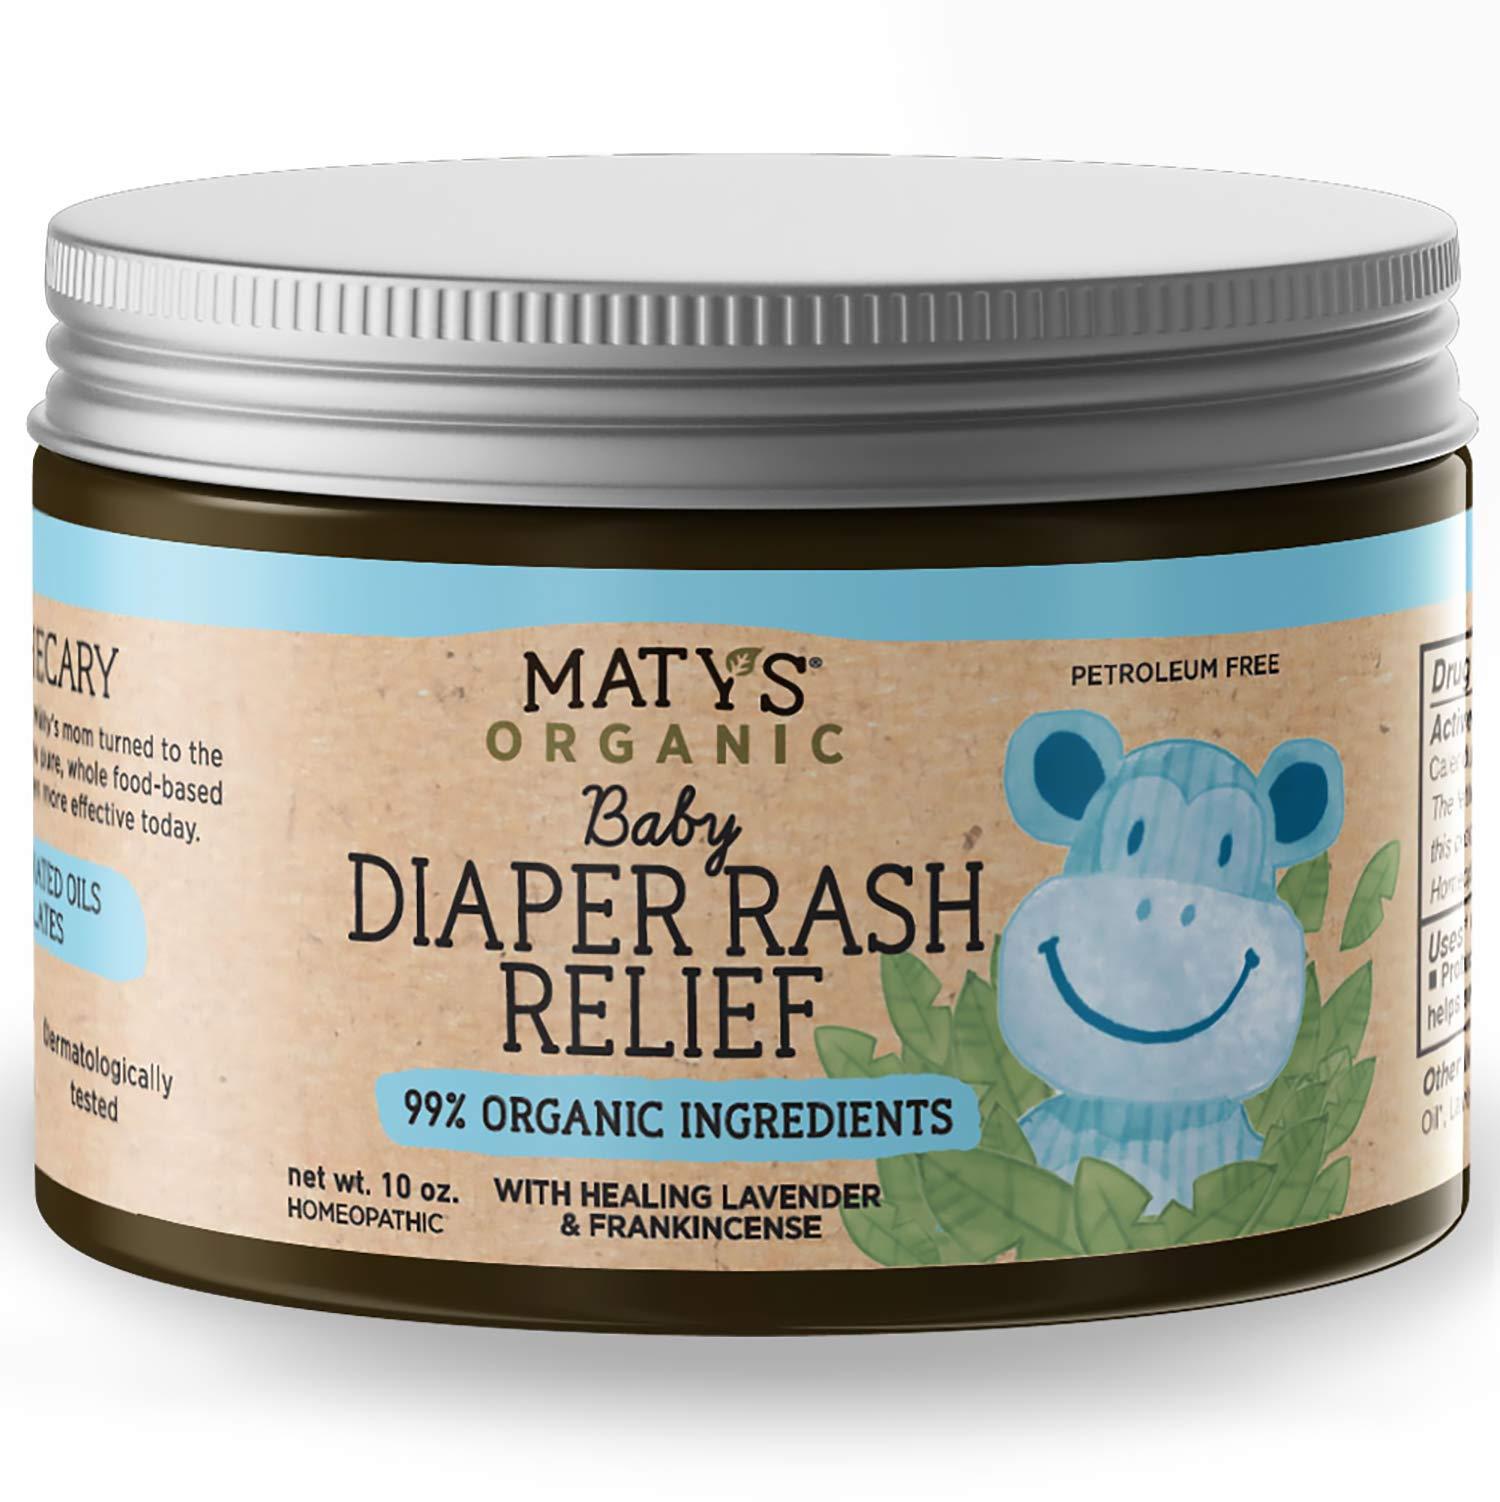 Maty's Organic Baby Diaper Rash Relief, Heals with Lavender, Aloe & Zinc, 10 Ounce by Matys